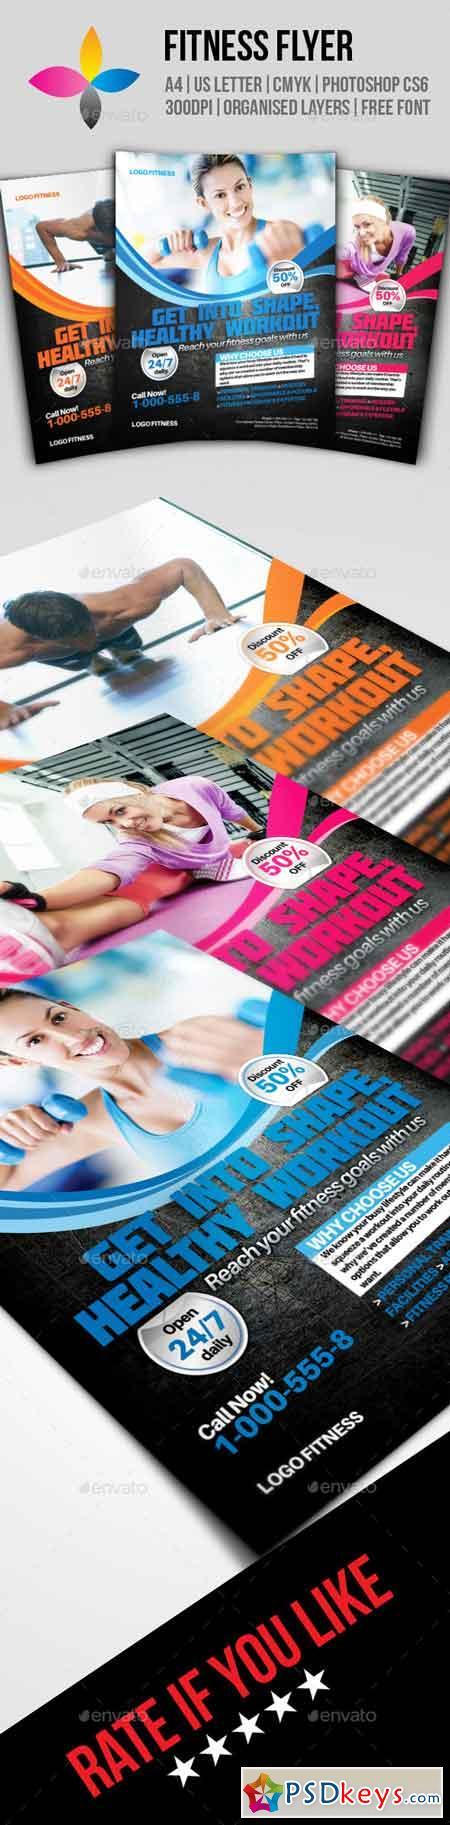 Fitness Flyer 8790461